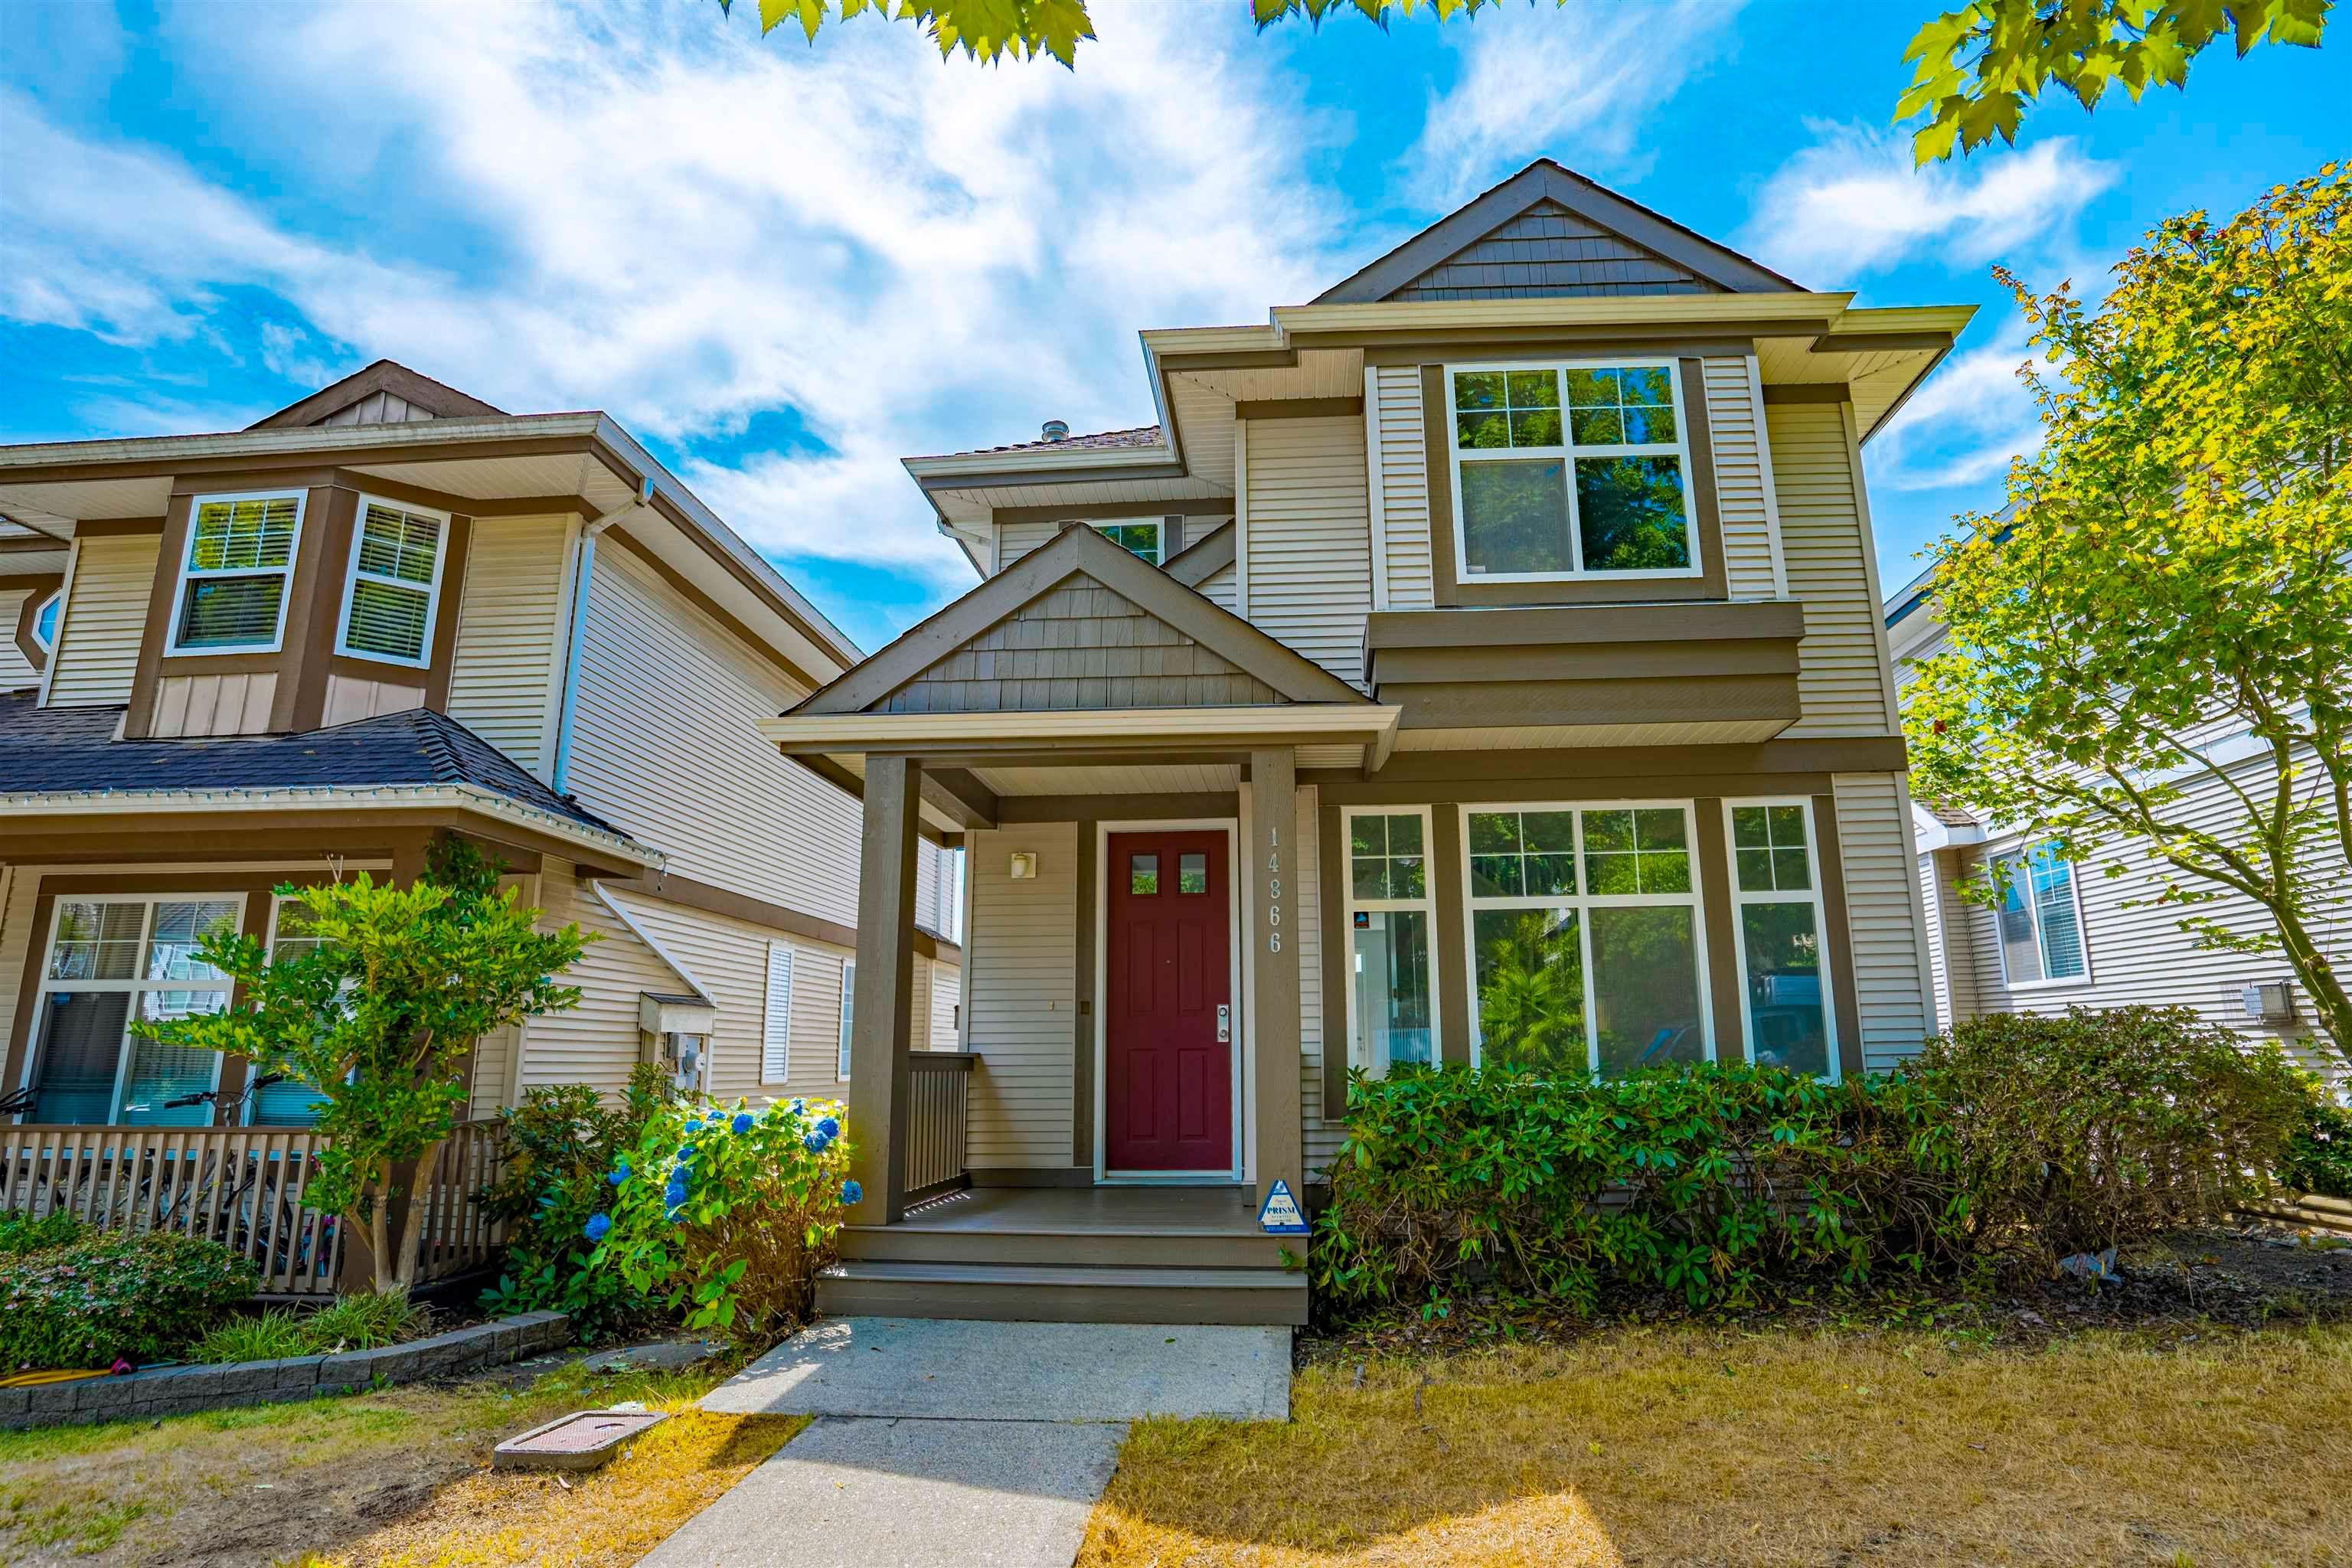 Main Photo: 14866 57 Avenue in Surrey: Sullivan Station House for sale : MLS®# R2606805